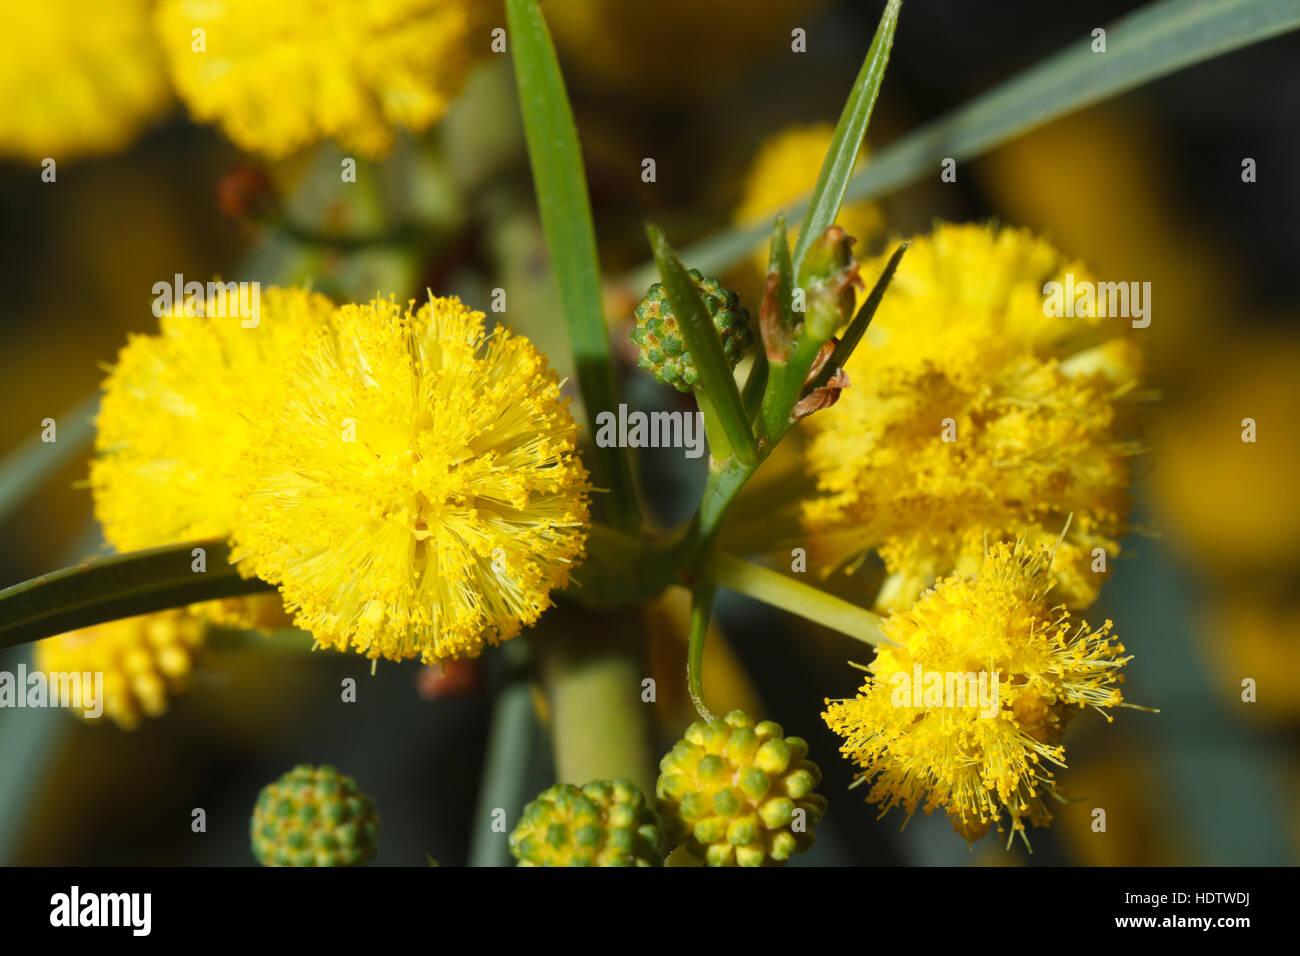 Mimosa tree yellow stock photos mimosa tree yellow stock images beautiful flowers of yellow mimosa macro outdoors horizontal stock image mightylinksfo